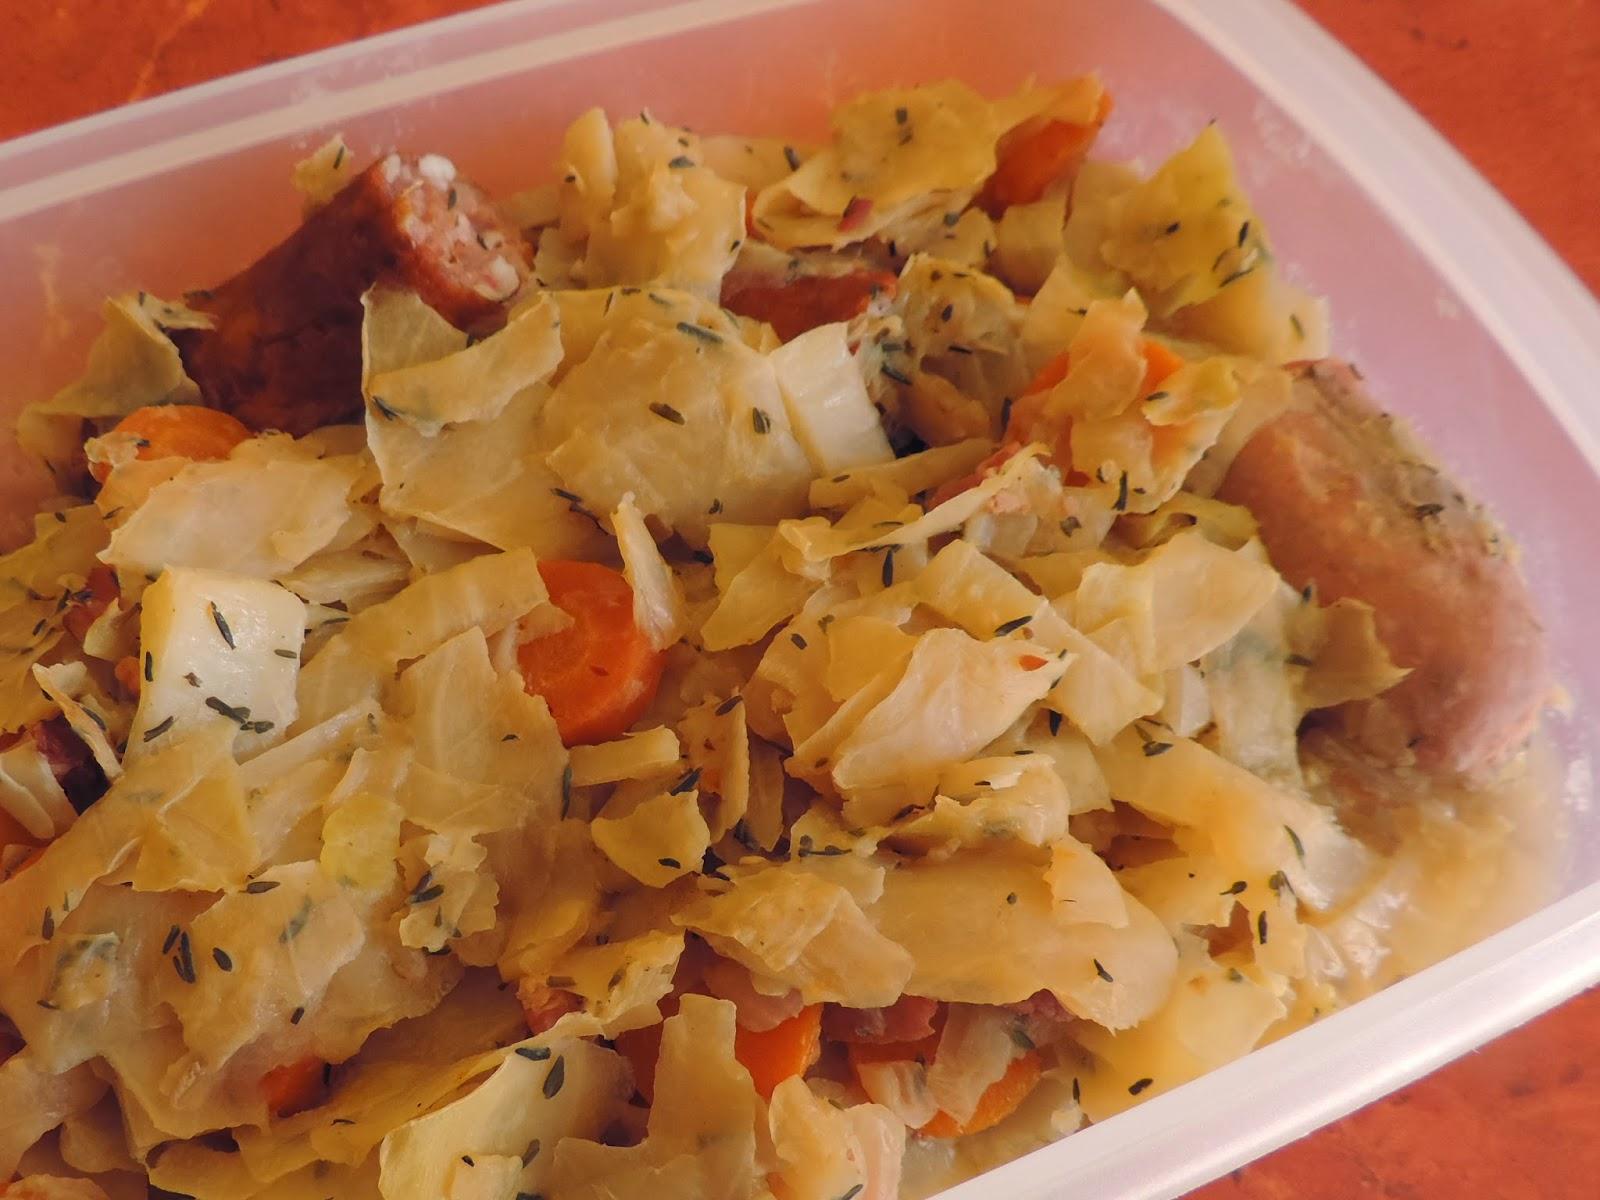 les petits plats de chou blanc saucisses cookeo